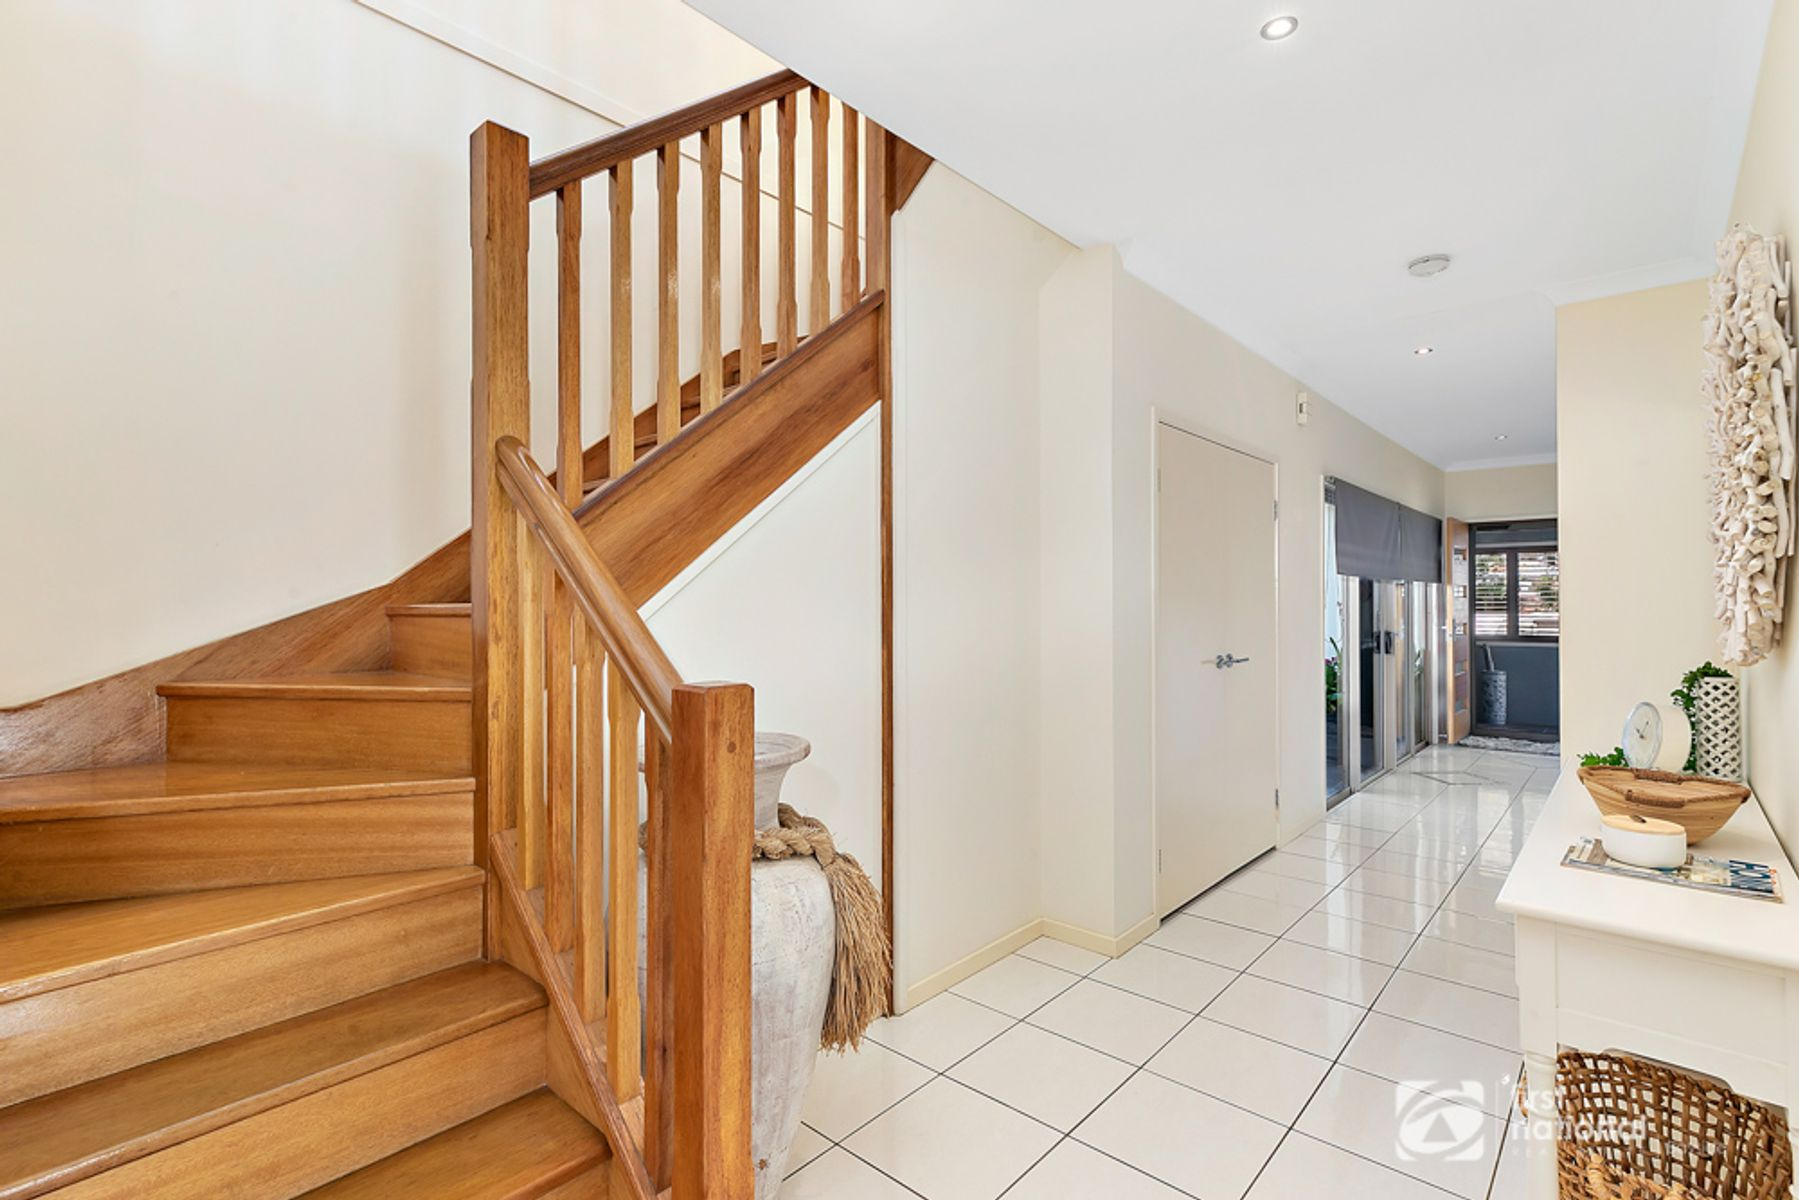 95 Thomas Street, Birkdale, QLD 4159